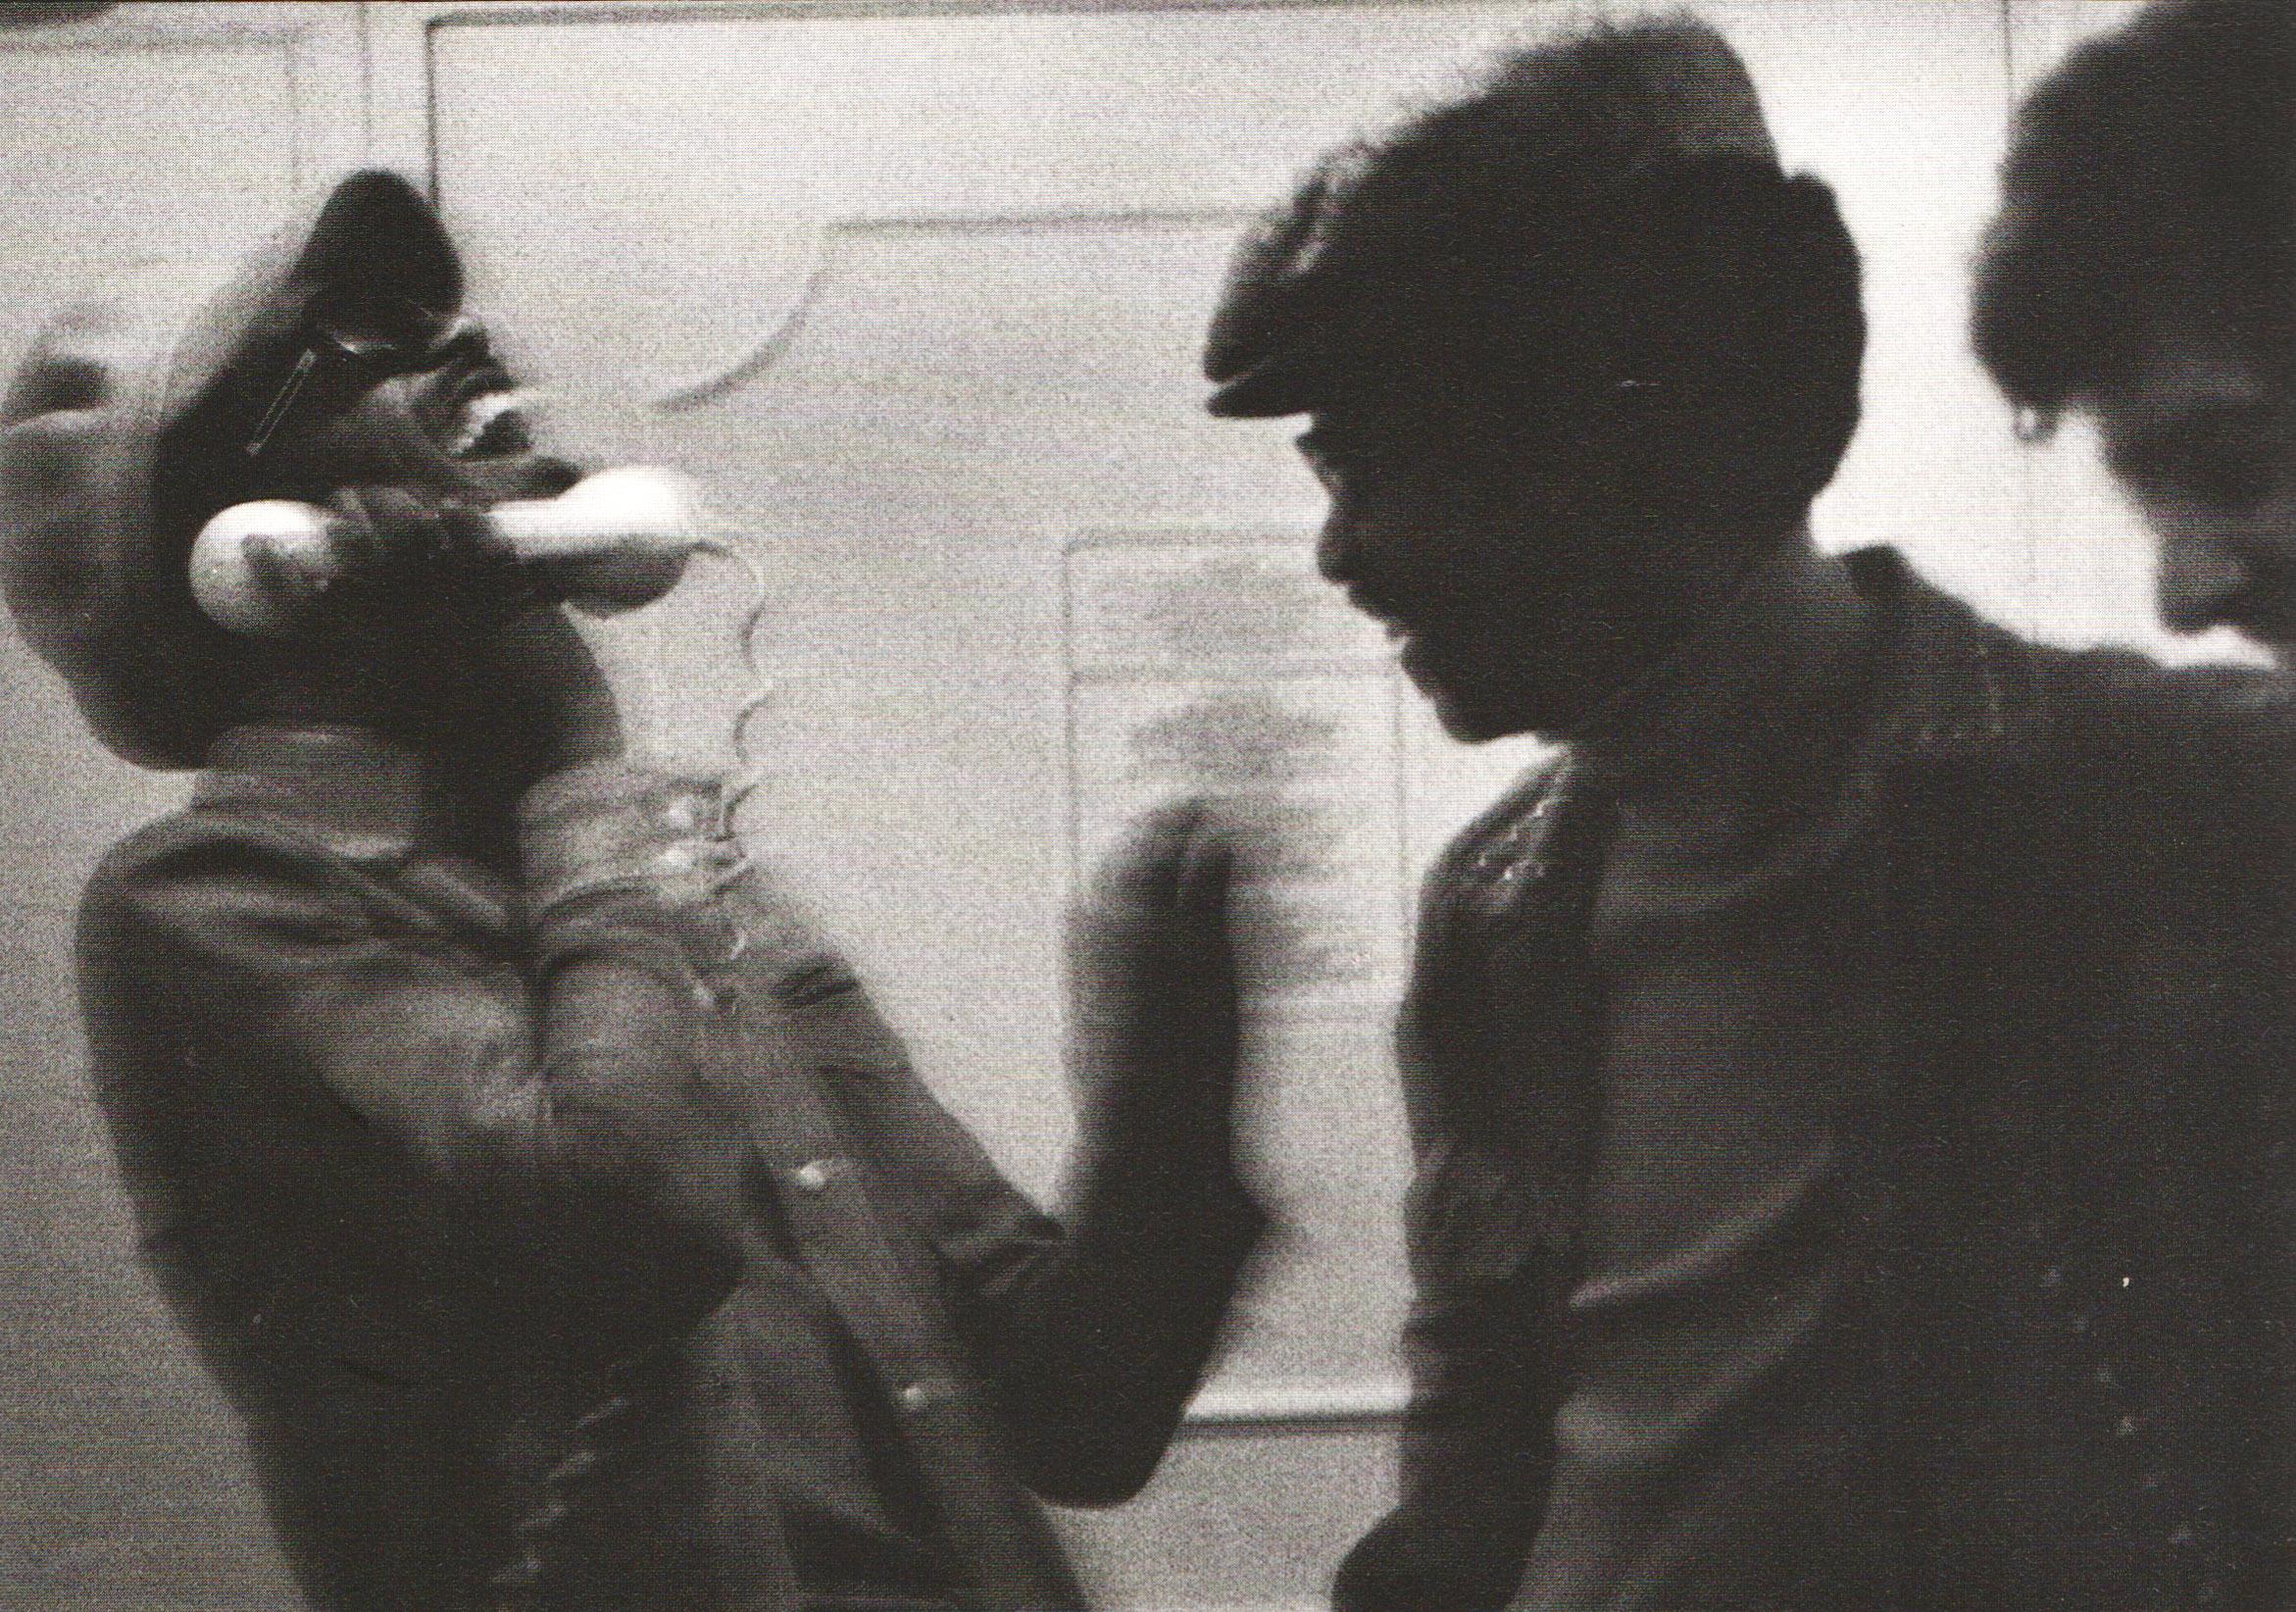 Stevie Wonder, Knightsbridge, 1974.